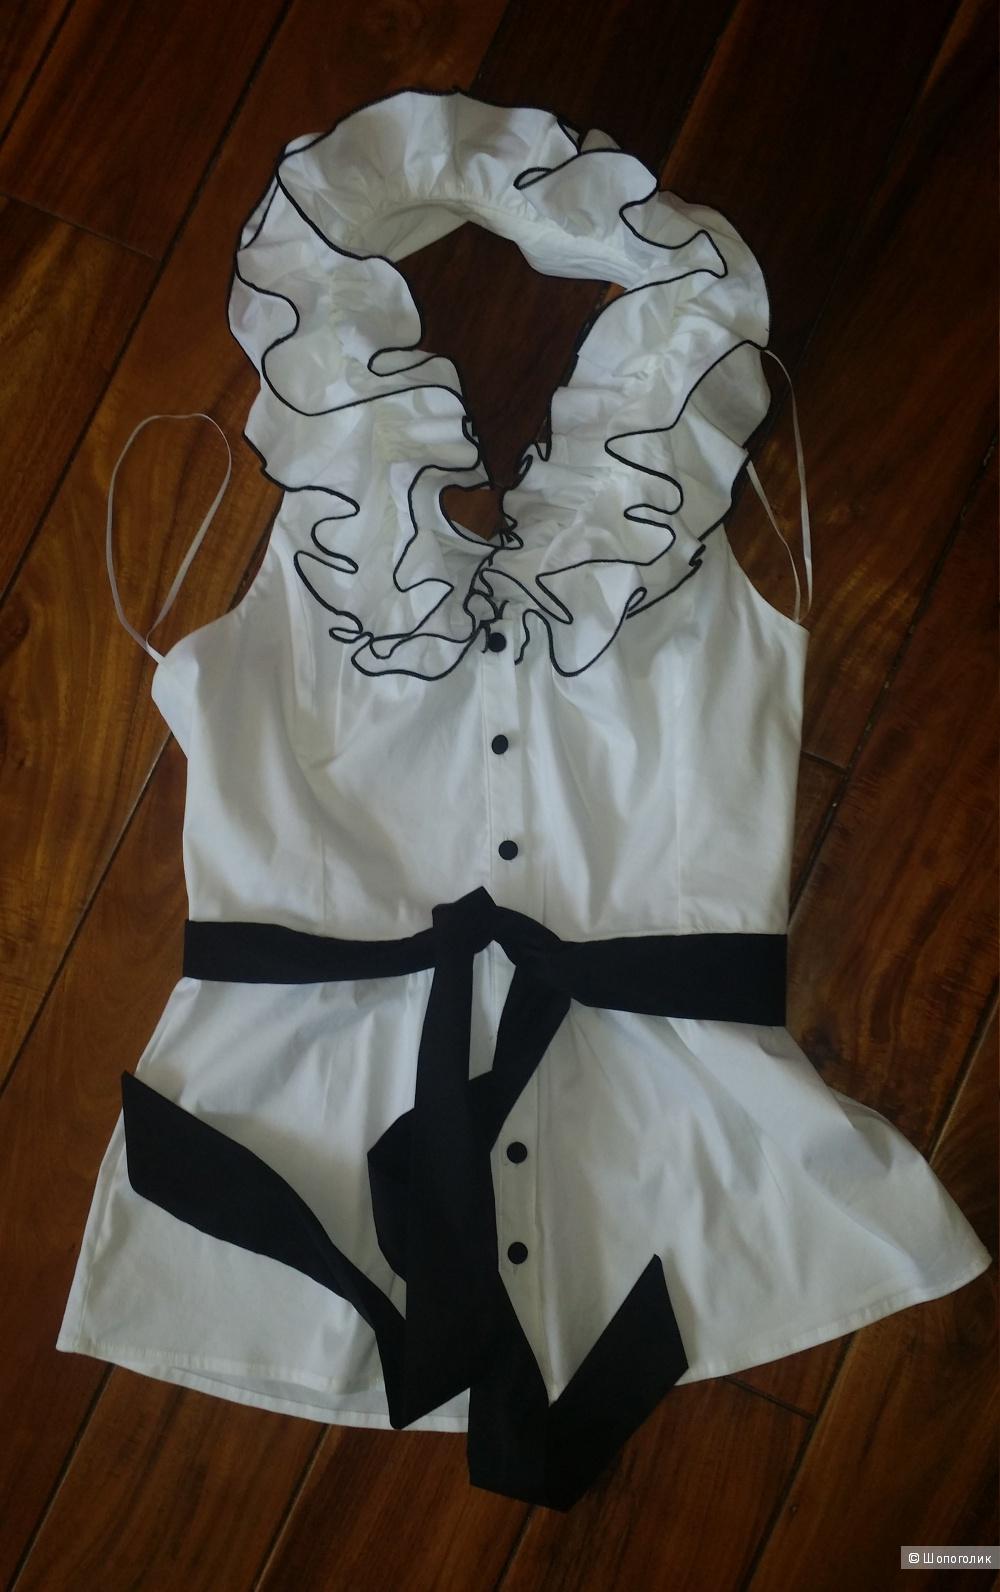 Топ-блузка Flavio Castellani, 44-46 размер